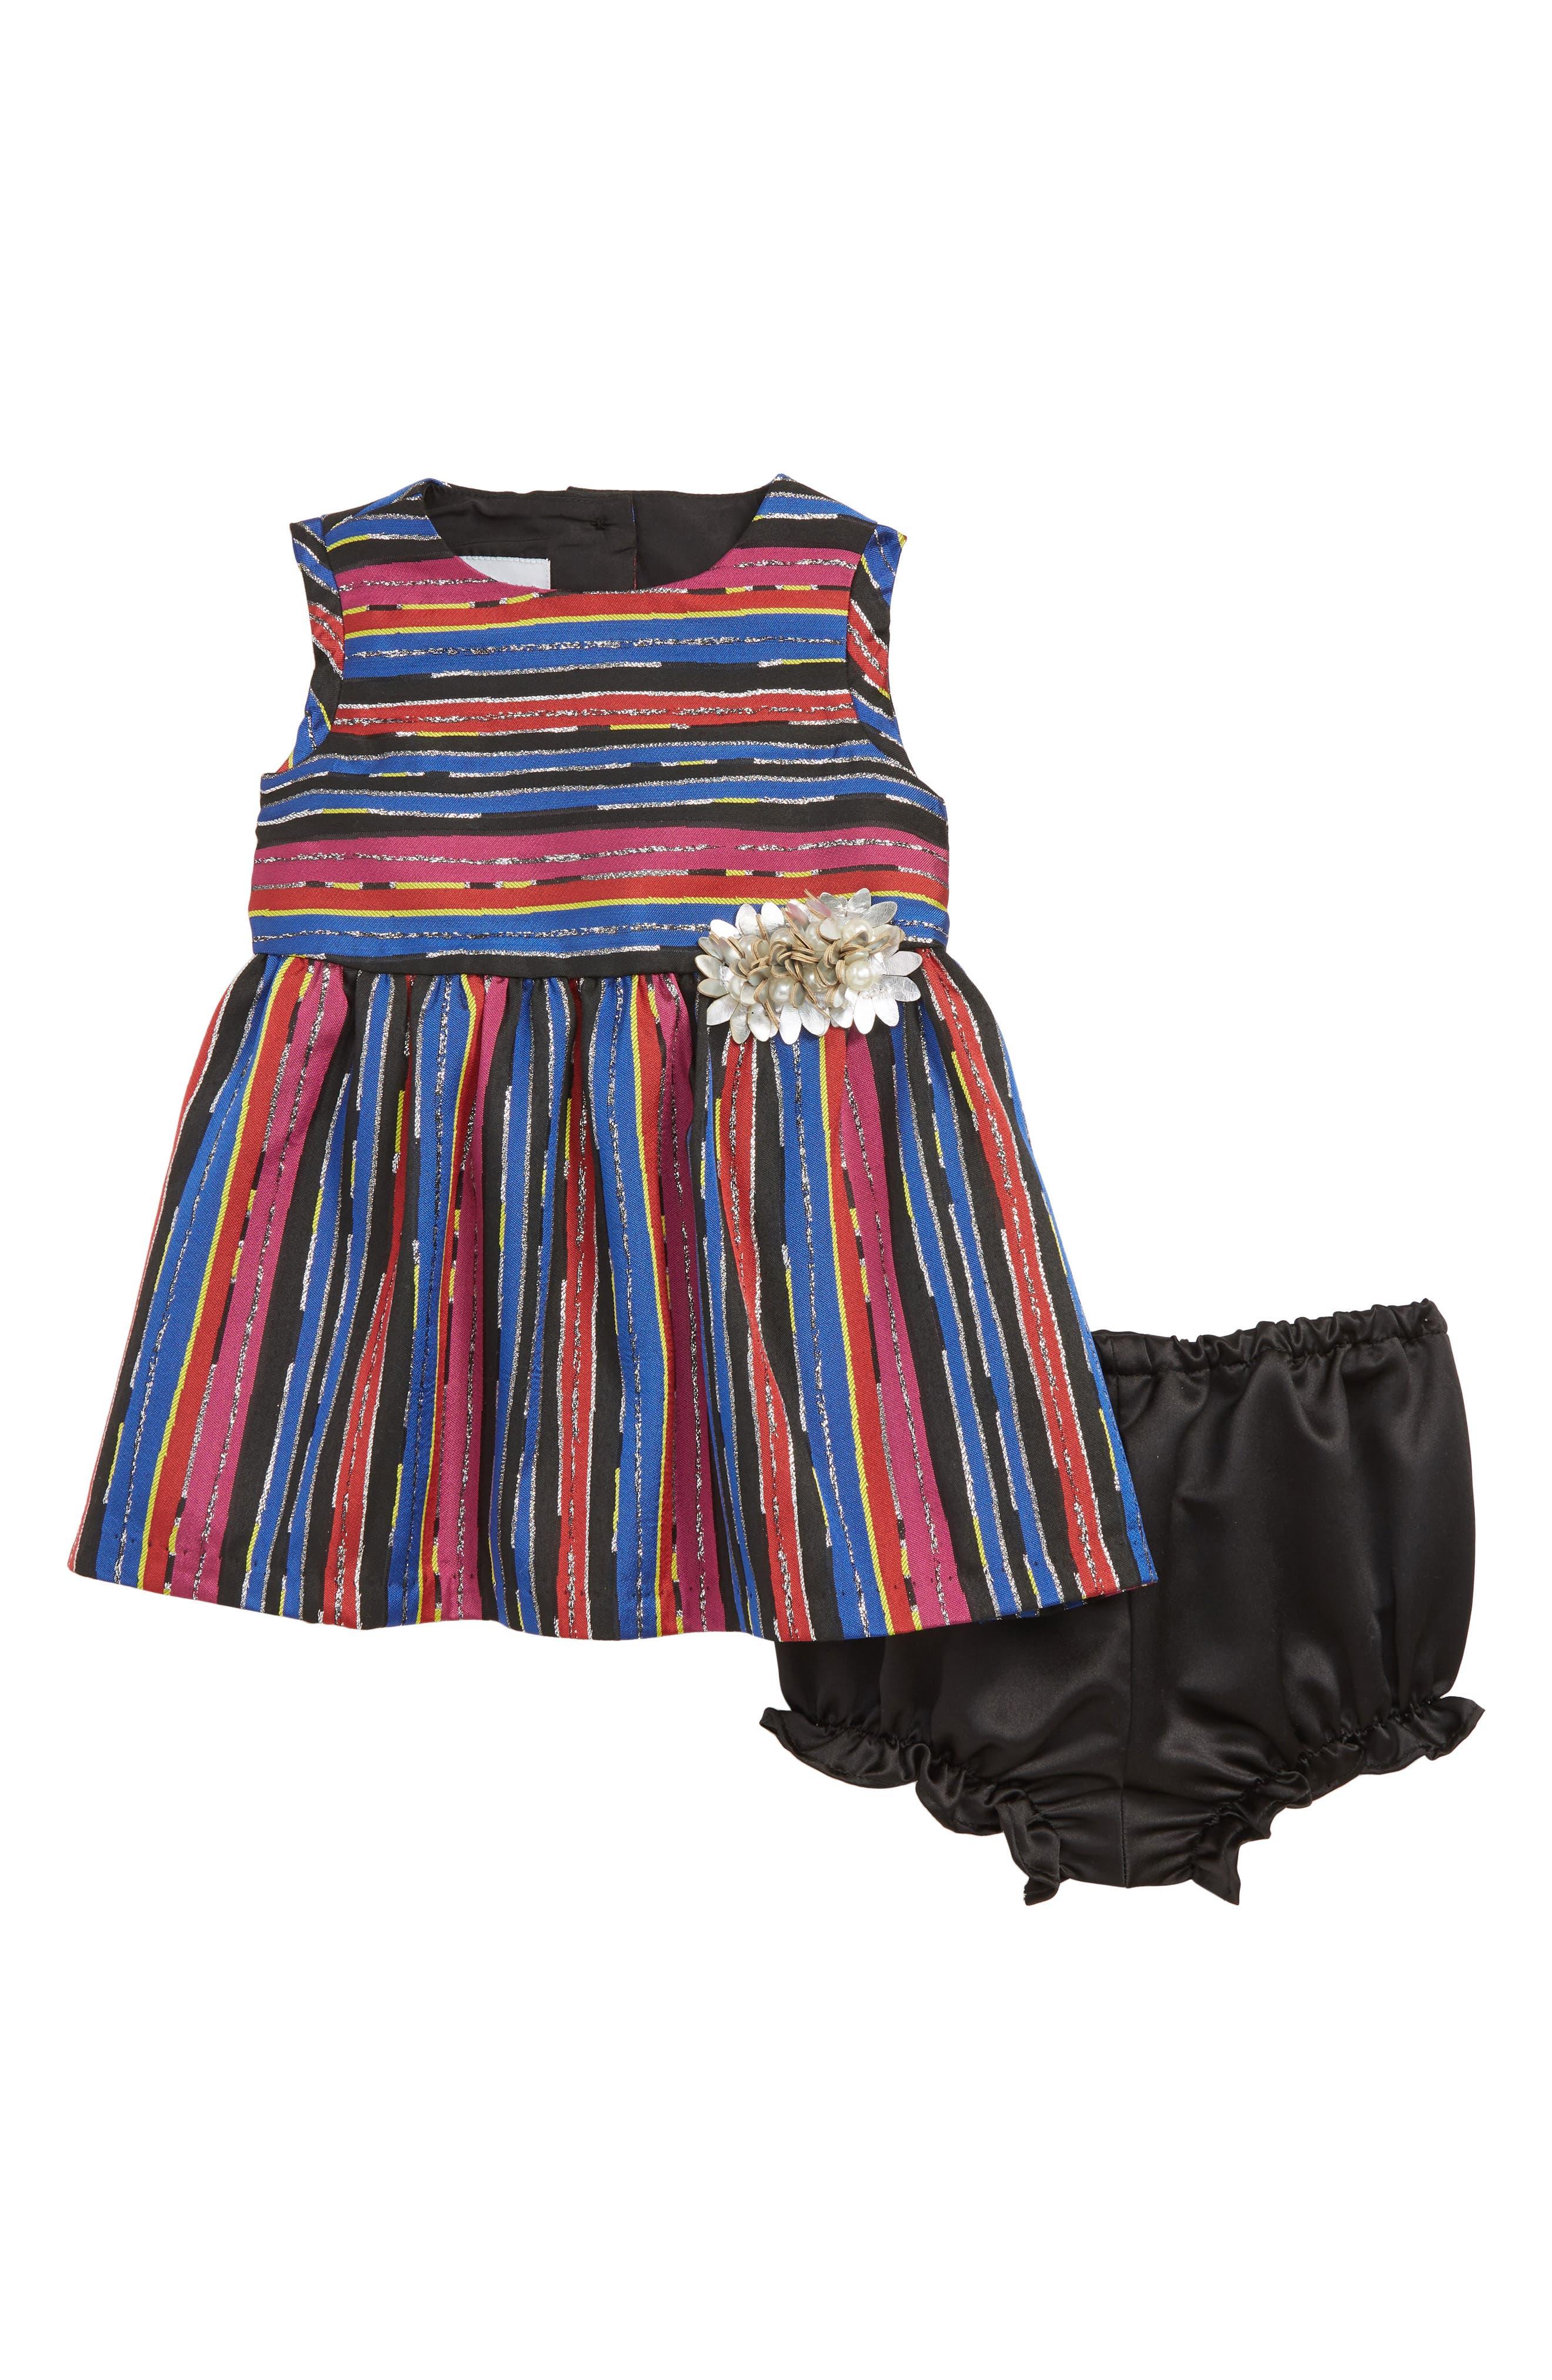 PIPPA & JULIE Stripe Brocade Dress, Main, color, BLUE MULTI